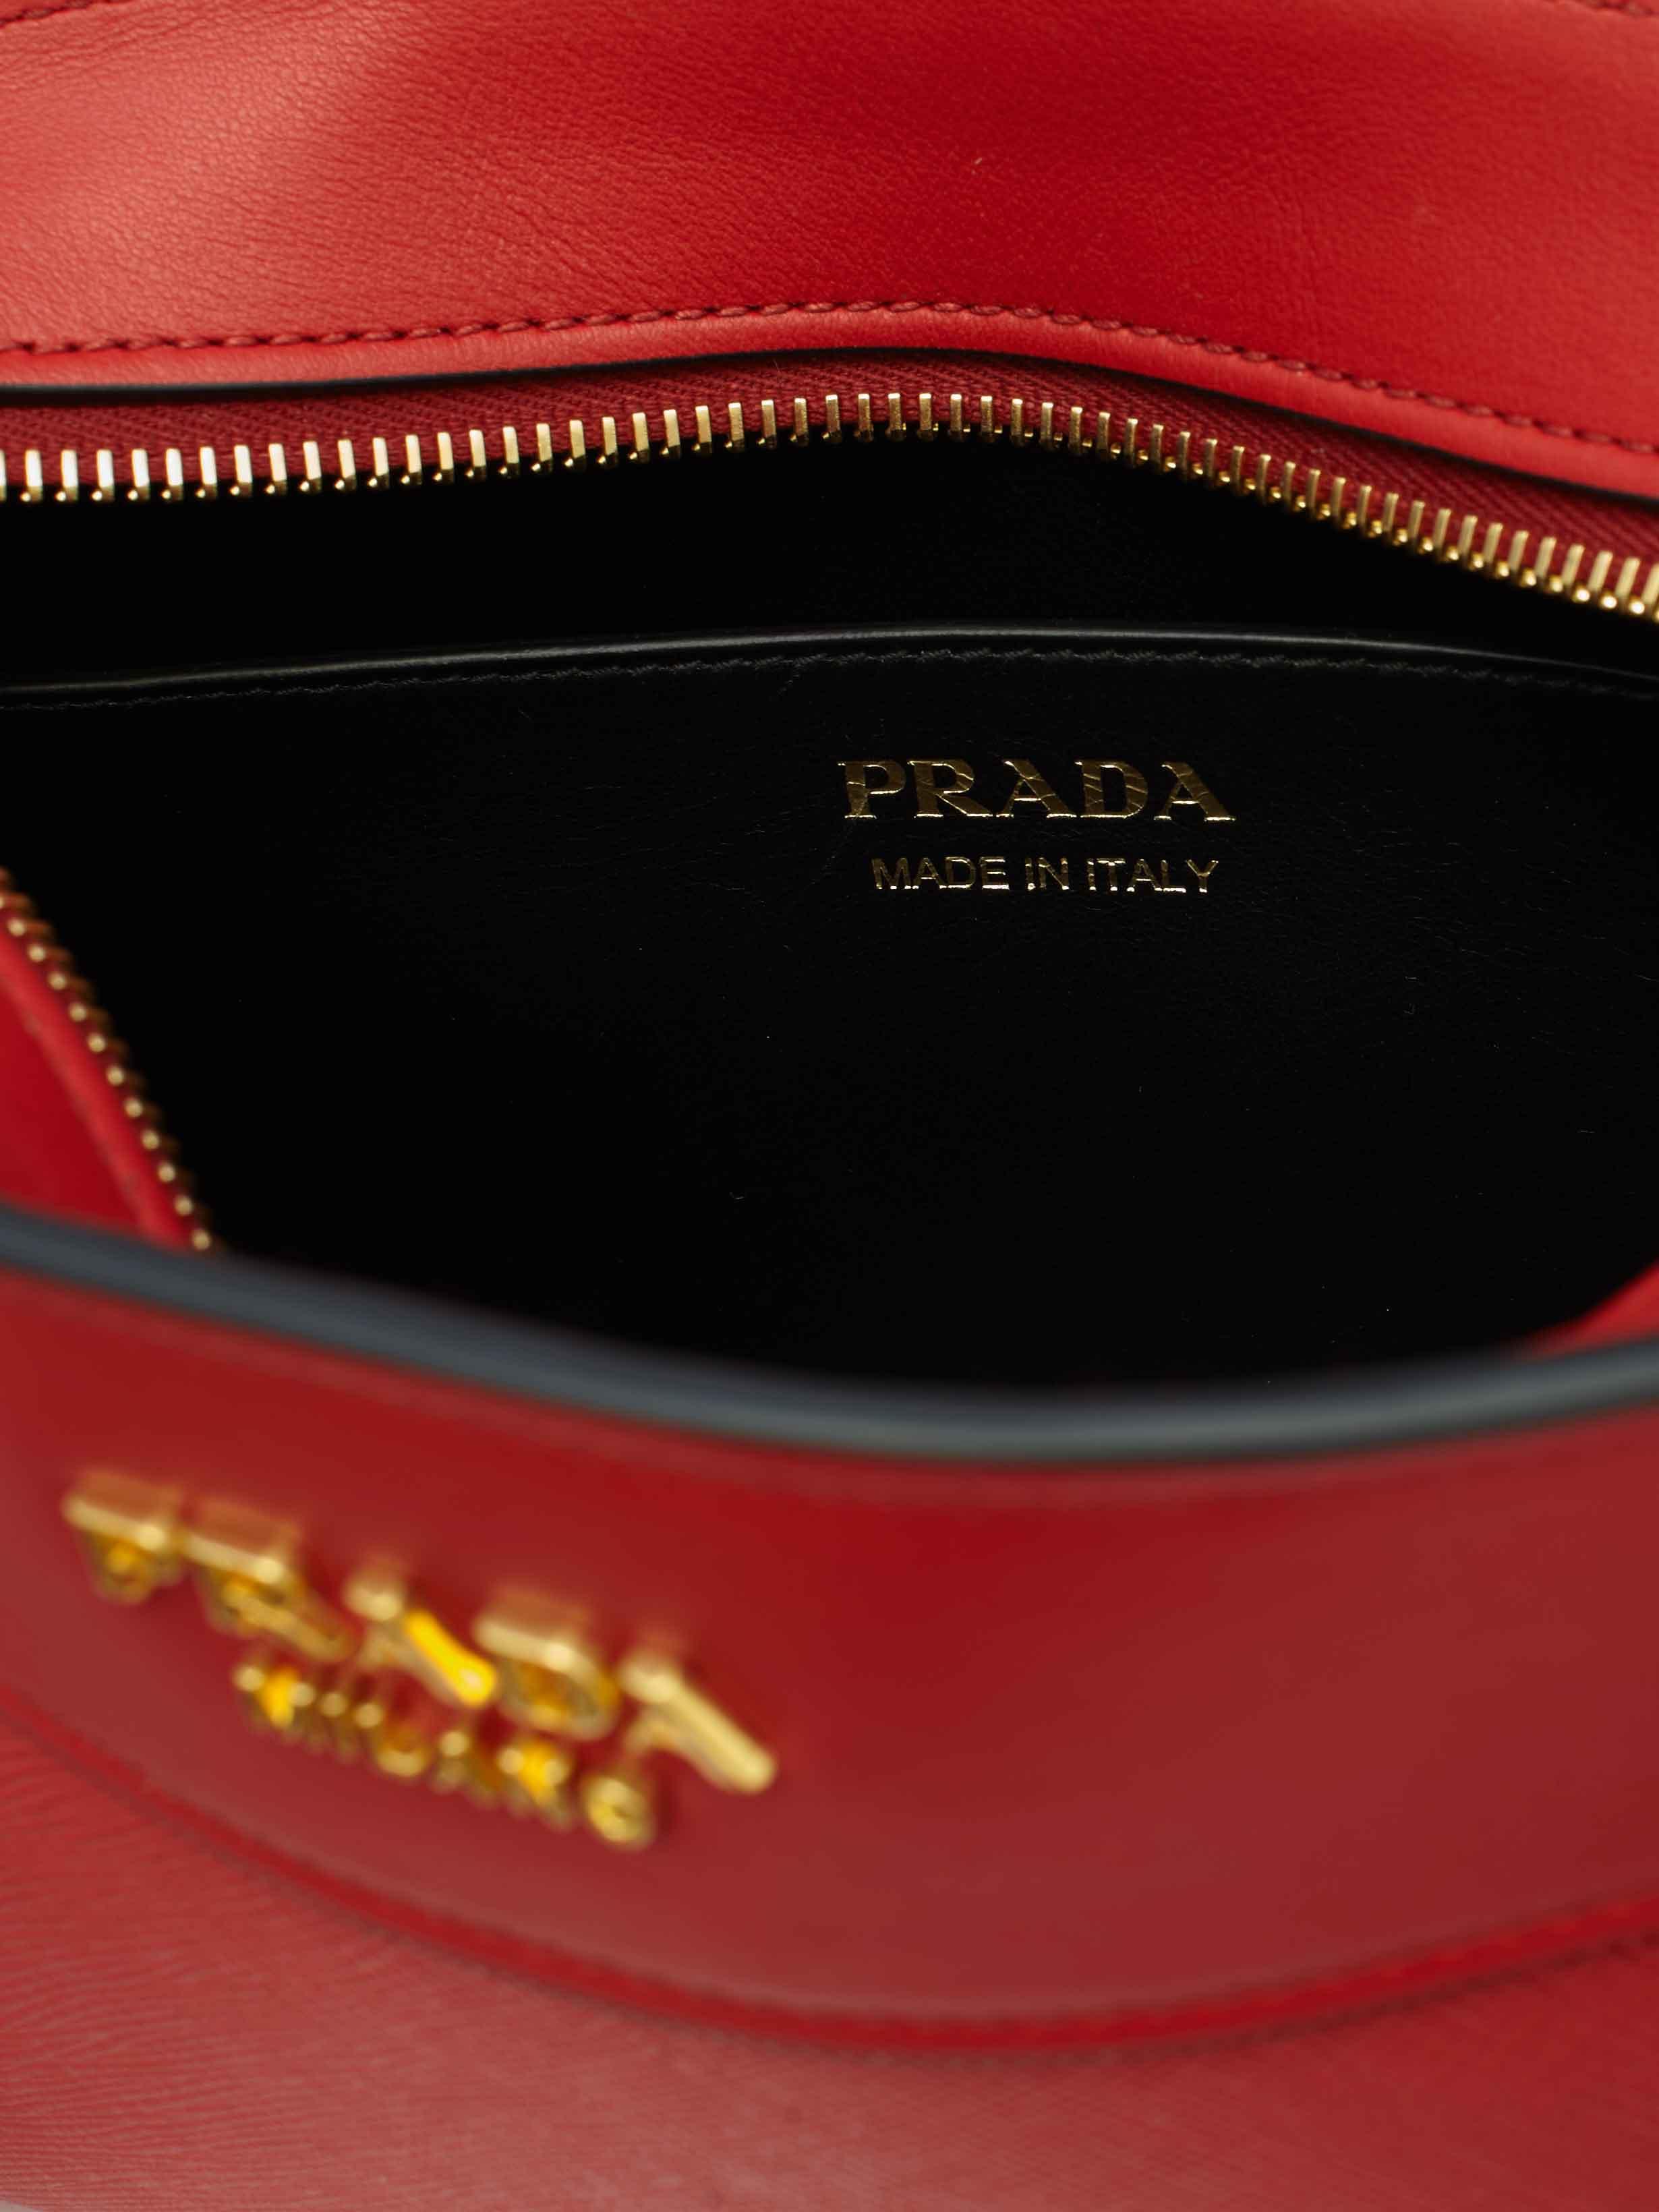 Prada Leather Esplanade Crossbody Bag in Red